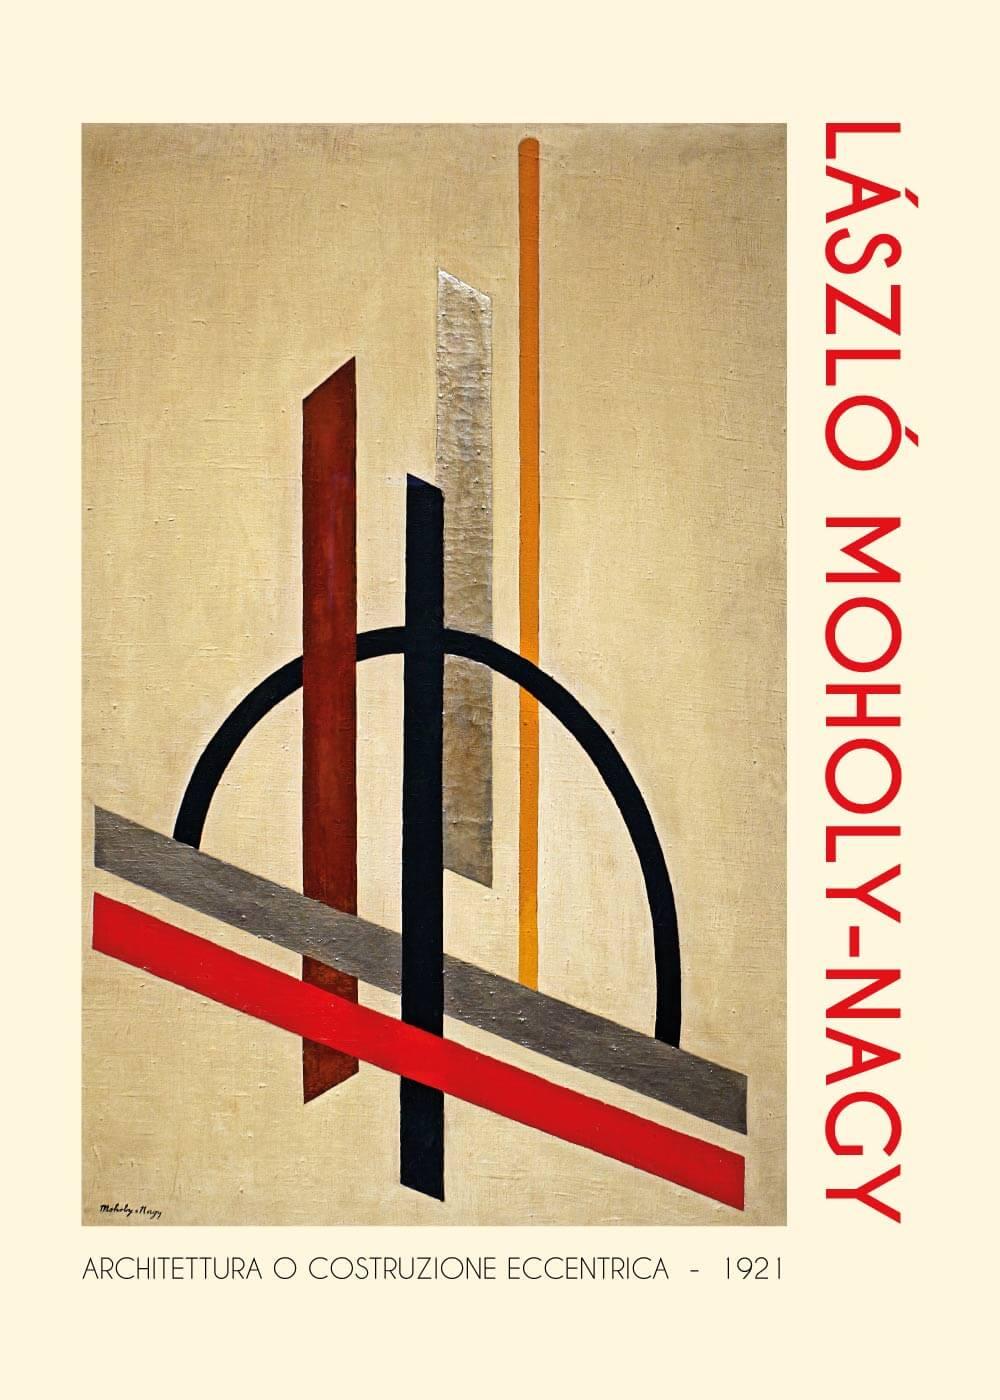 Billede af Architettura o costrozione eccentrica - László Moholy-Nagy kunstplakat